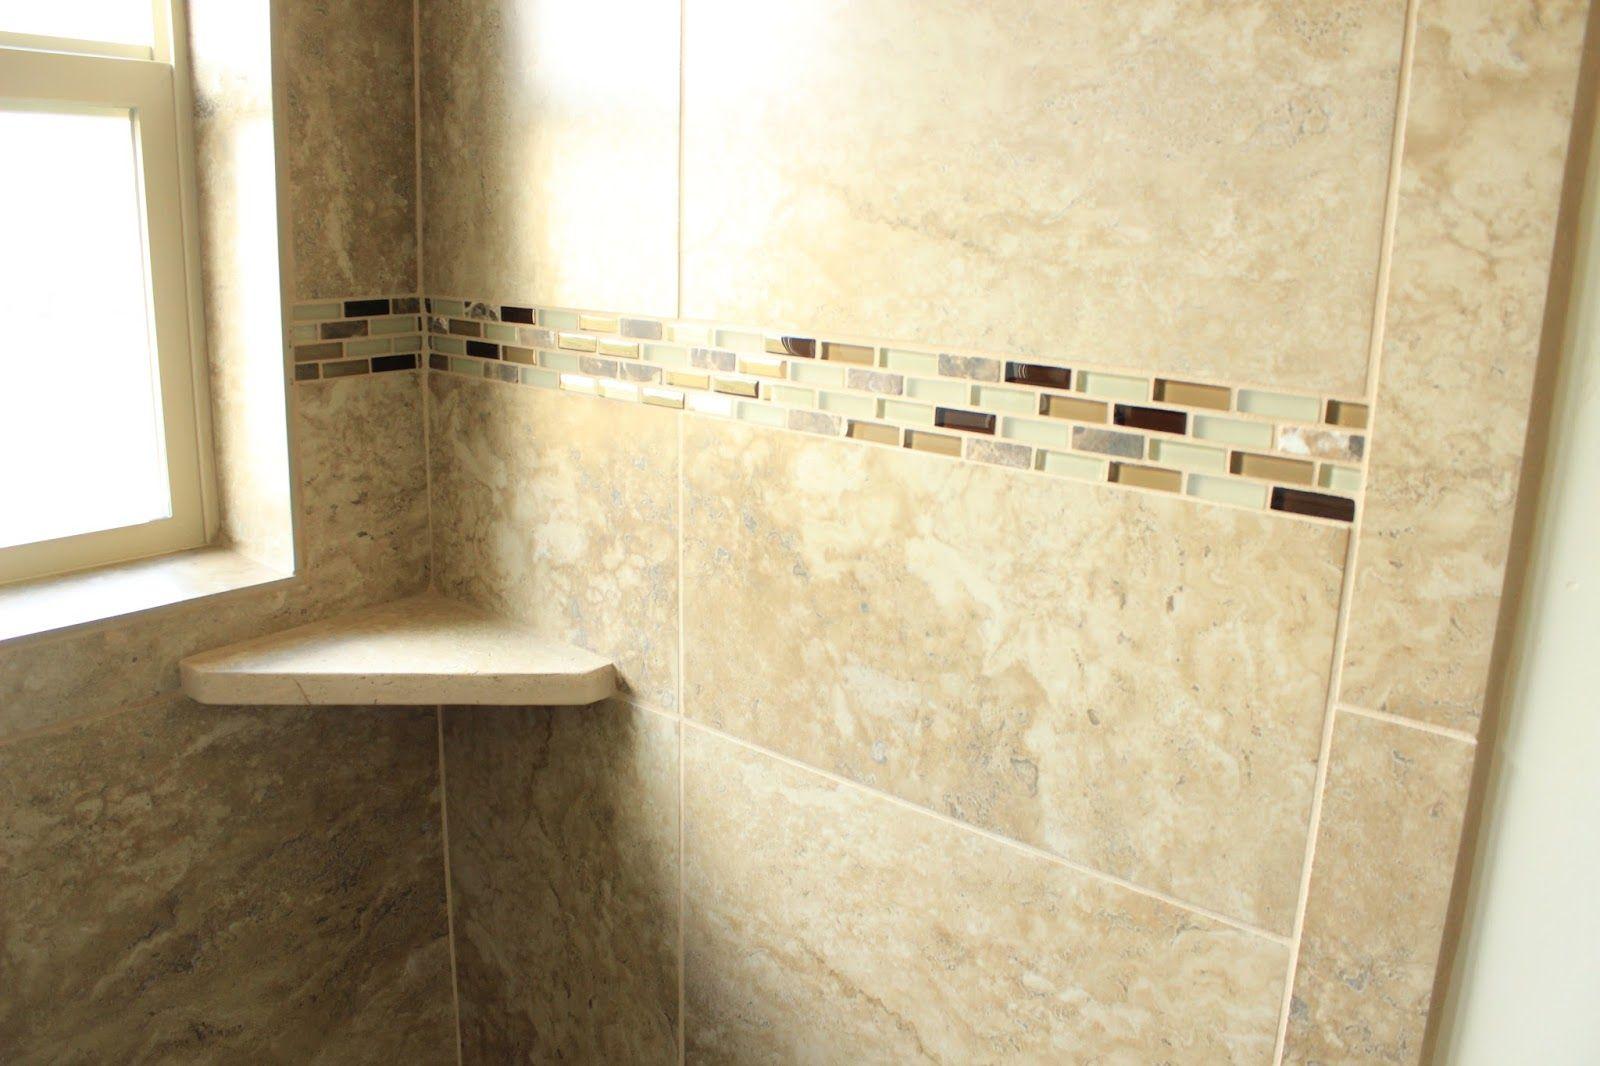 emser tile lucerne with venetian gold granite - Google Search | Name ...